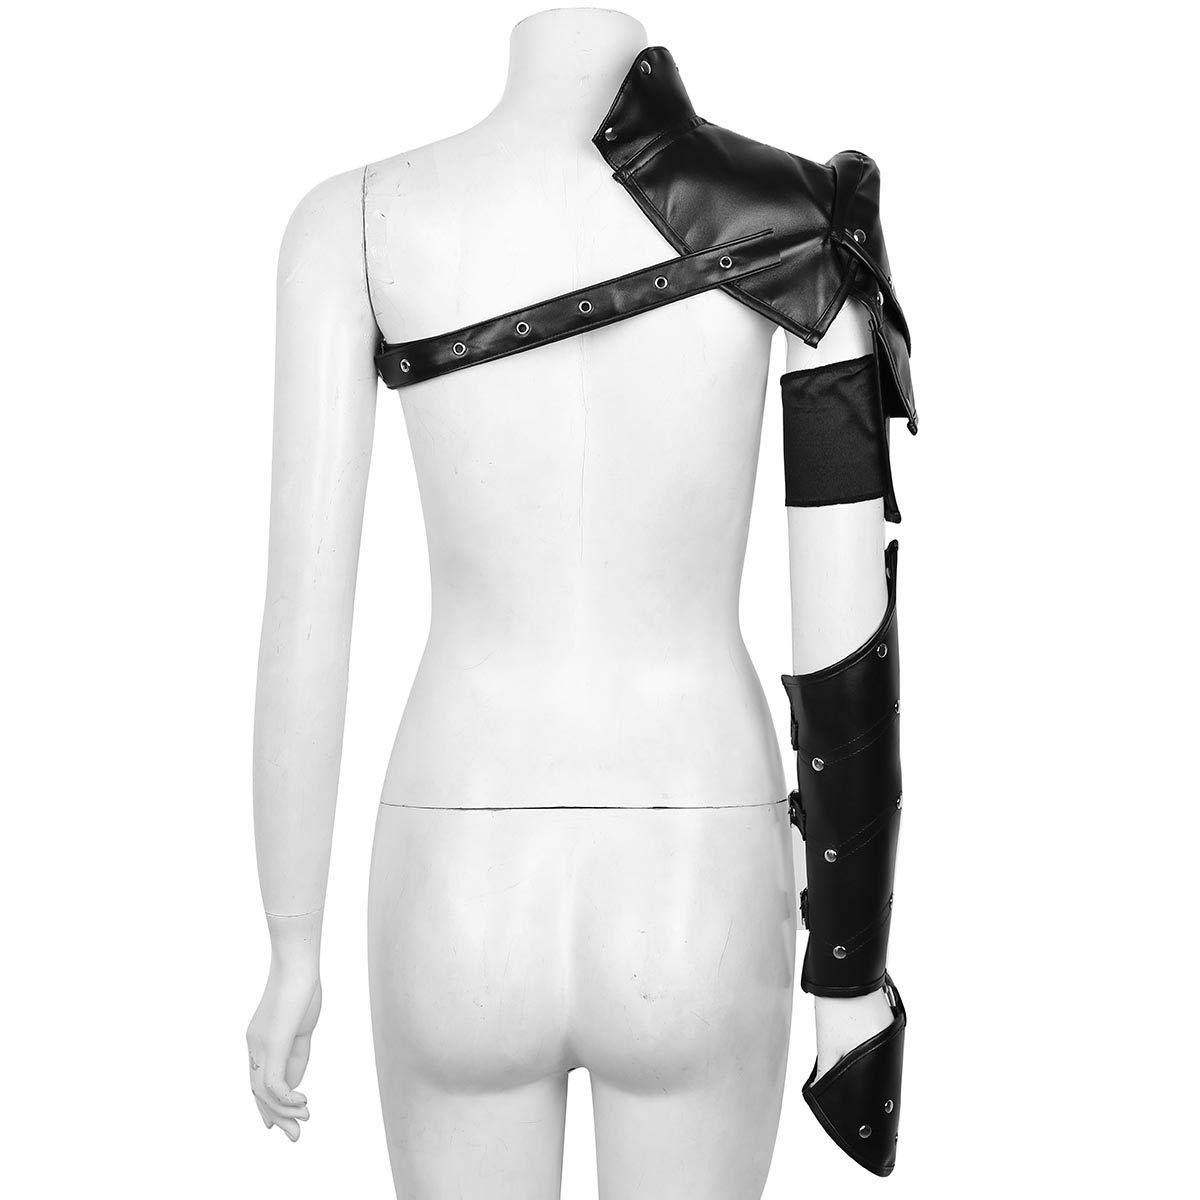 iEFiEL Steampunk Costume Shoulder Armors Metal Rivets PU Leather Retro Armlet Armband Armor Shrug